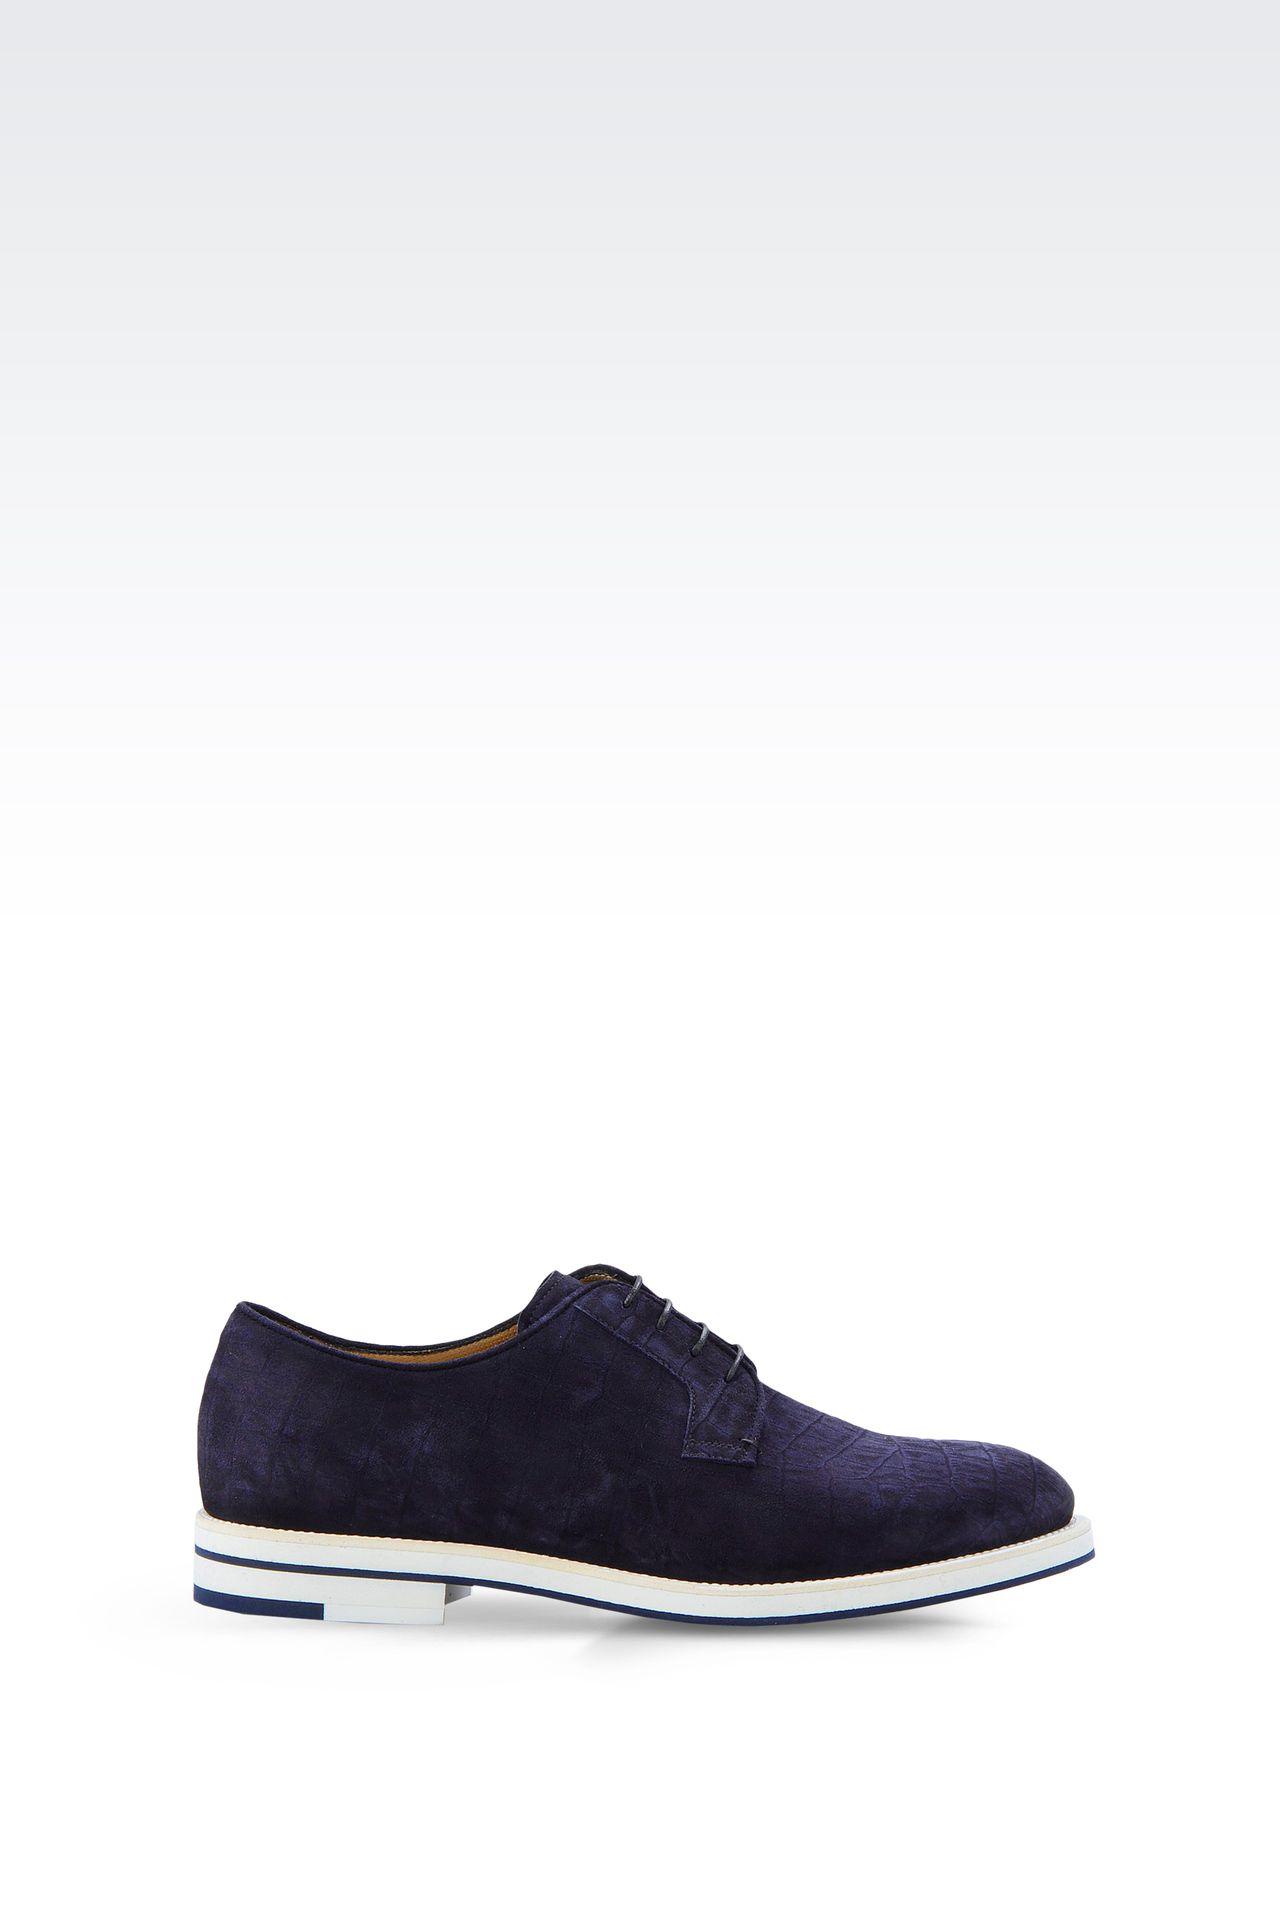 CROCODILE PRINT SUEDE DERBY: Lace-up shoes Men by Armani - 0